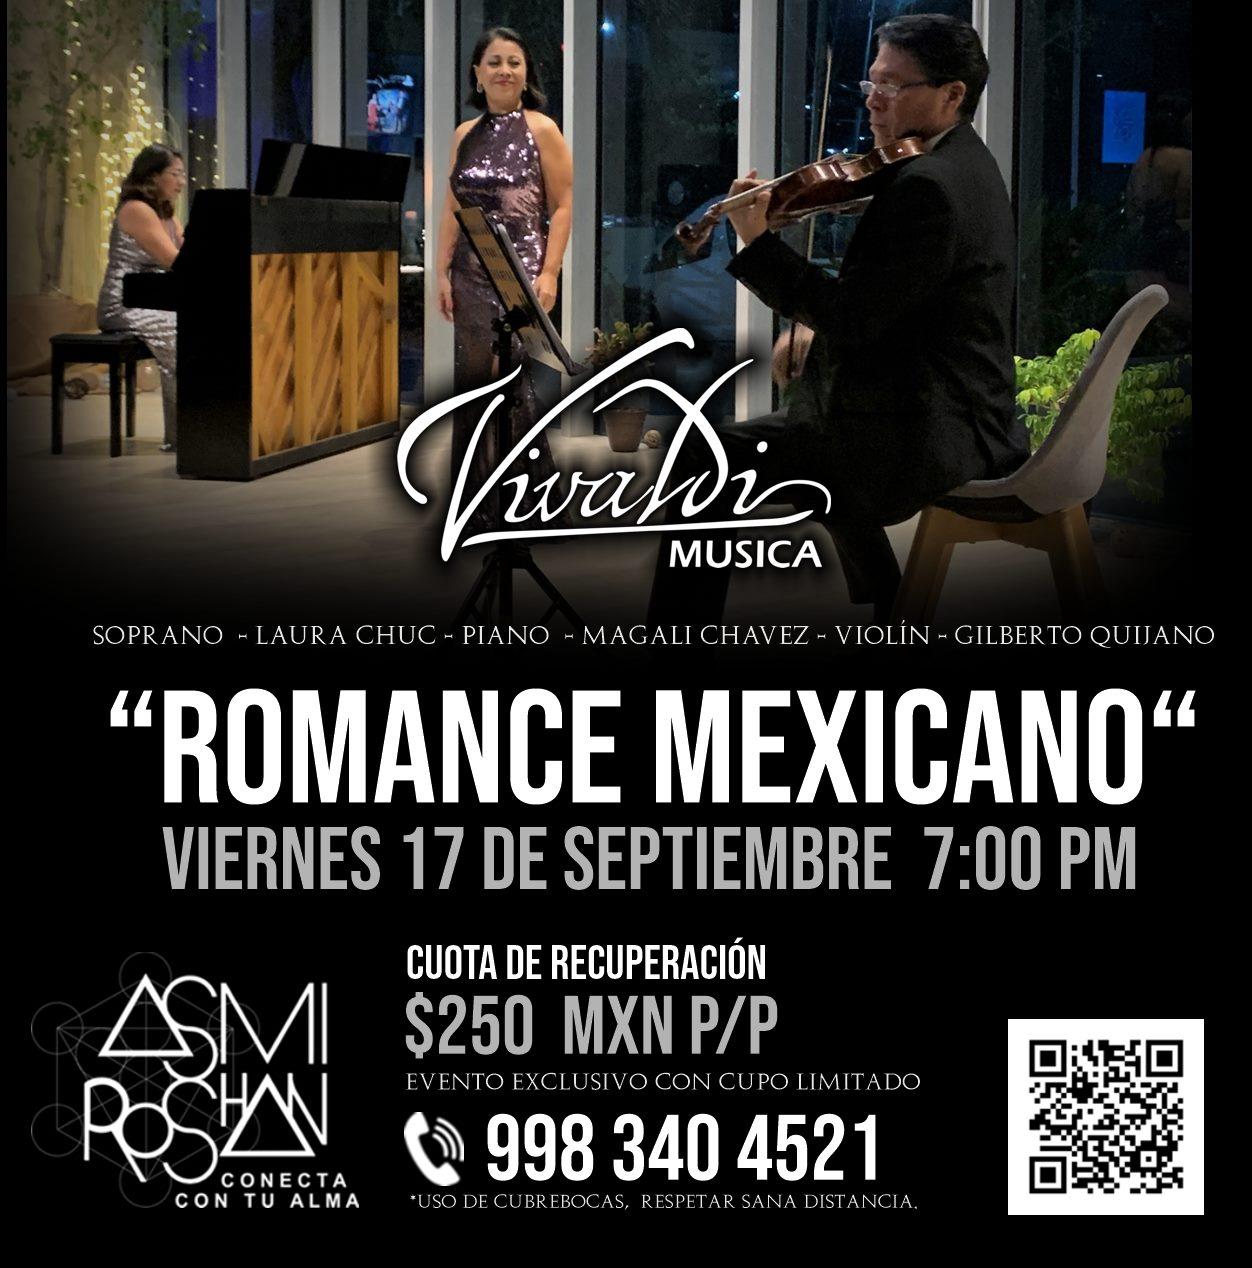 ROMANCE MEXICANO